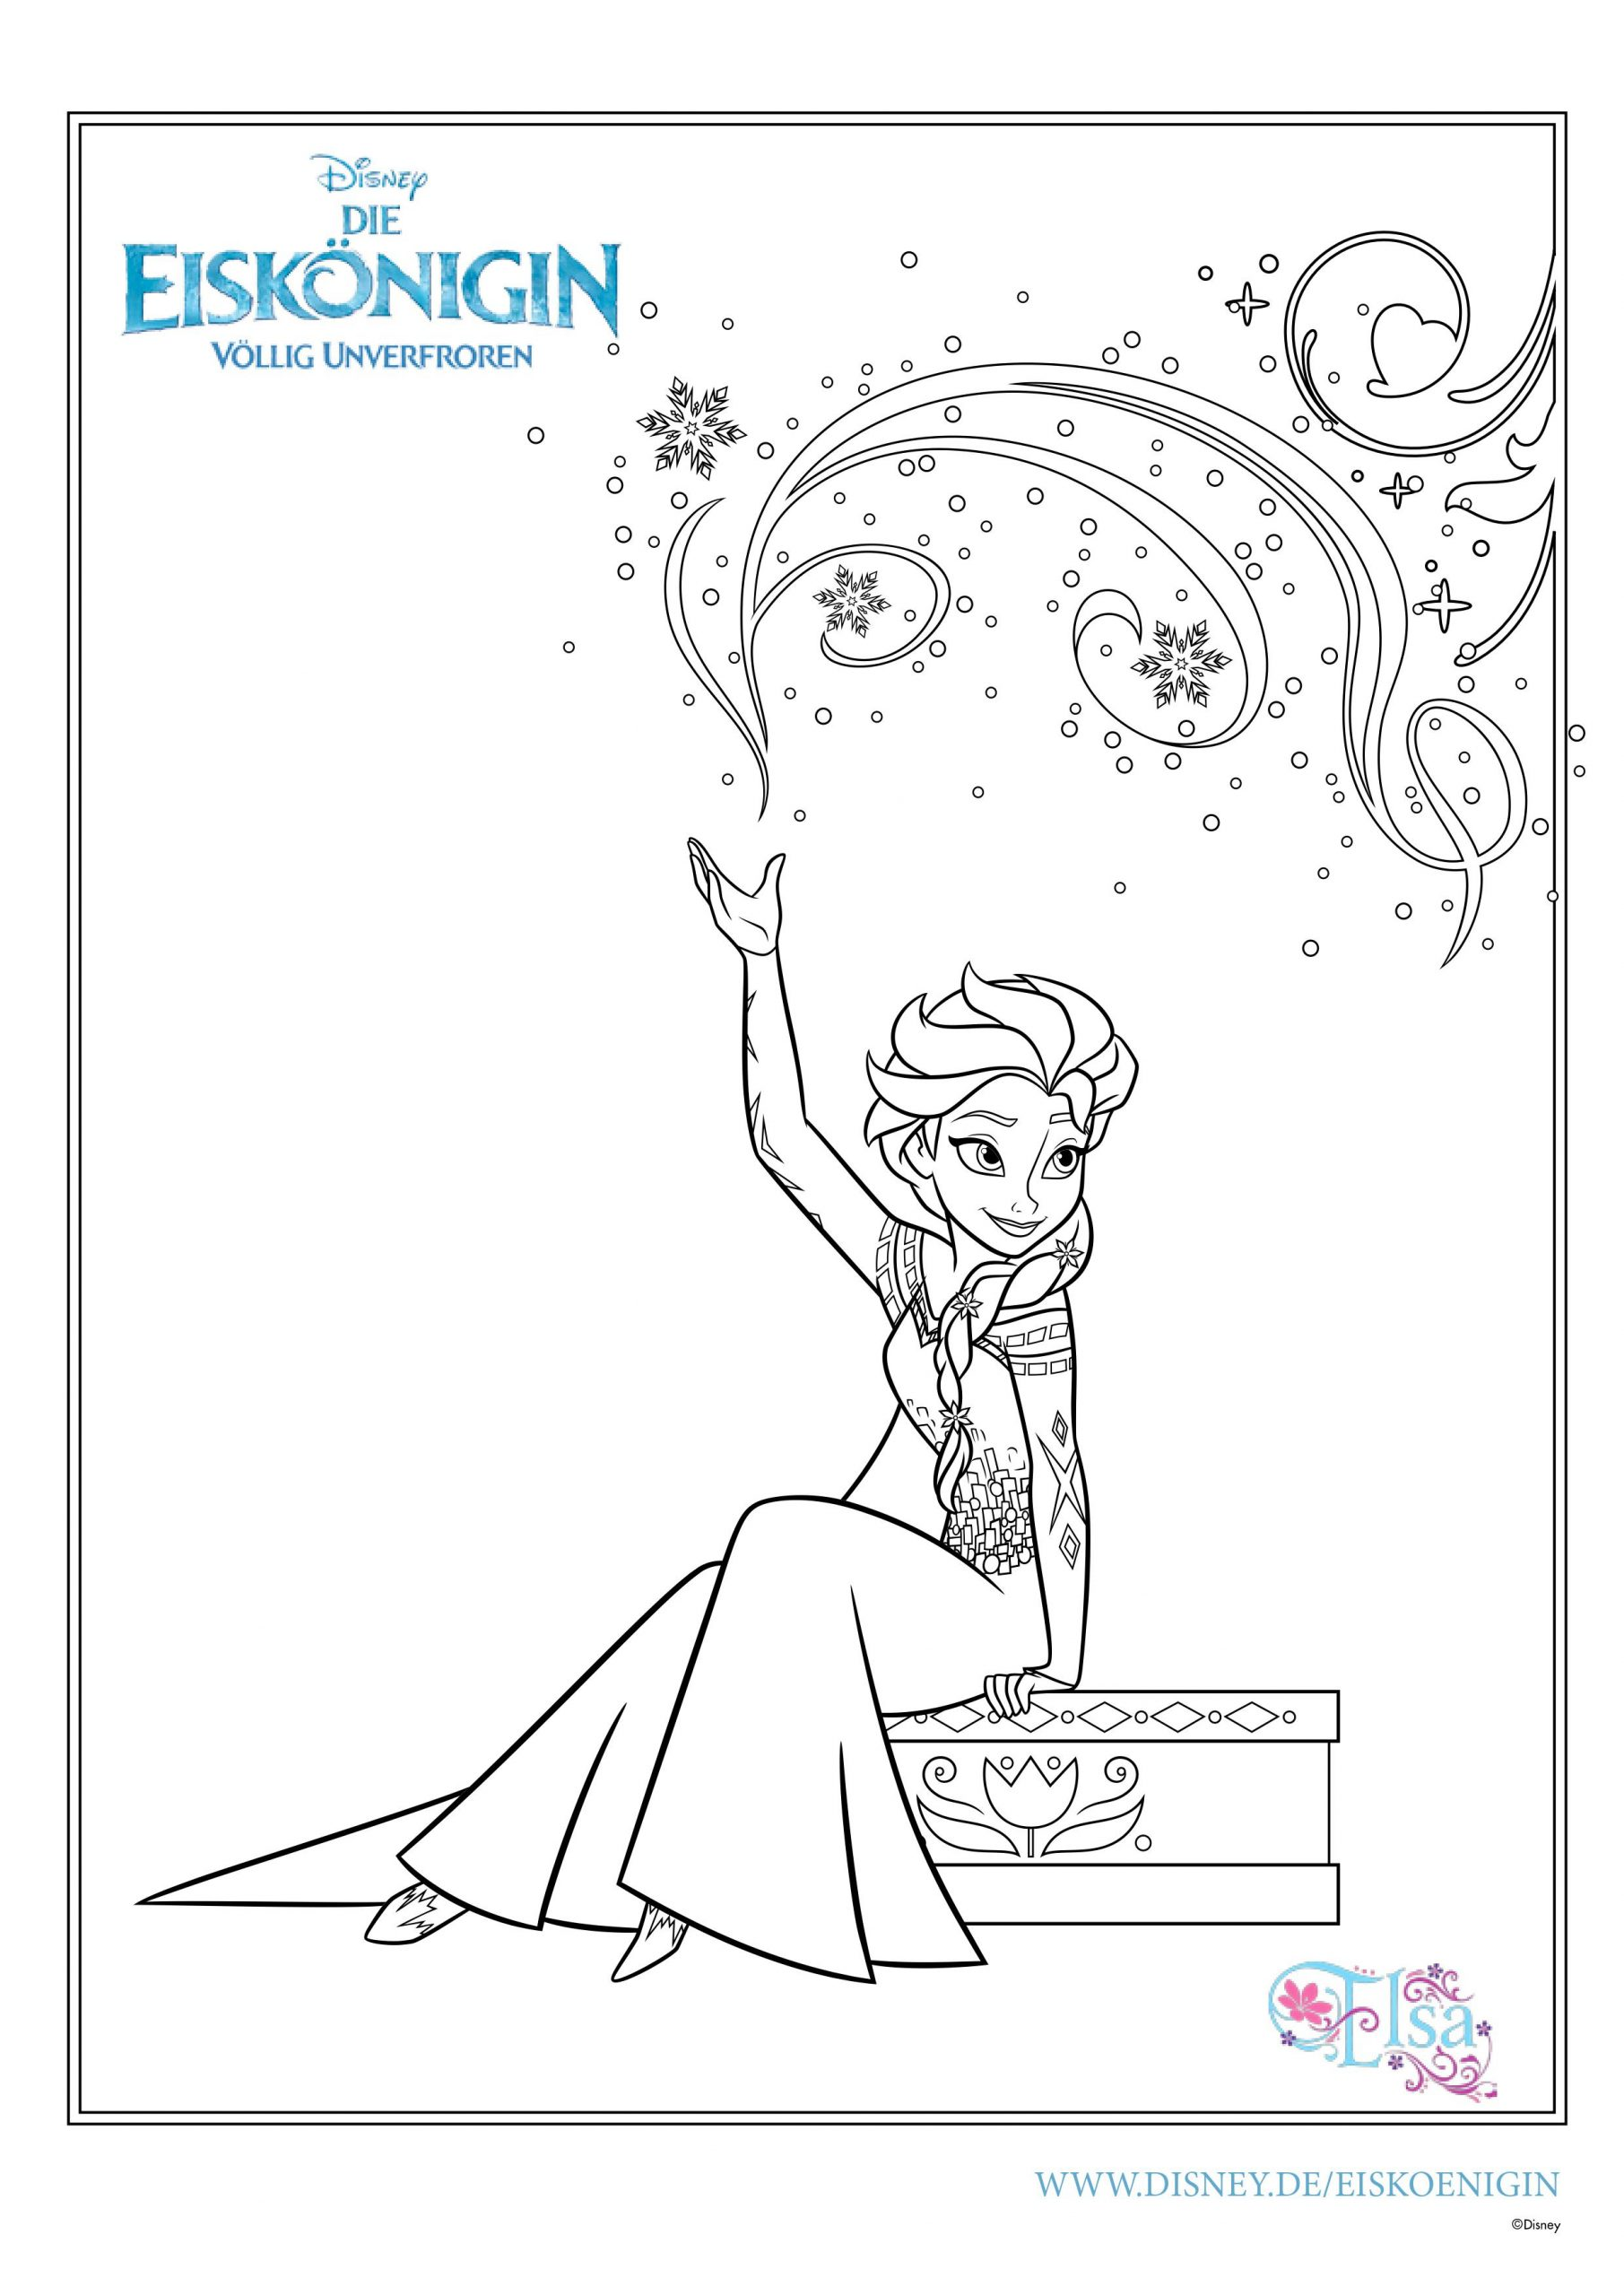 Ausmalbilder Eiskönigin | Mytoys-Blog ganzes Malvorlagen Kostenlos Disney